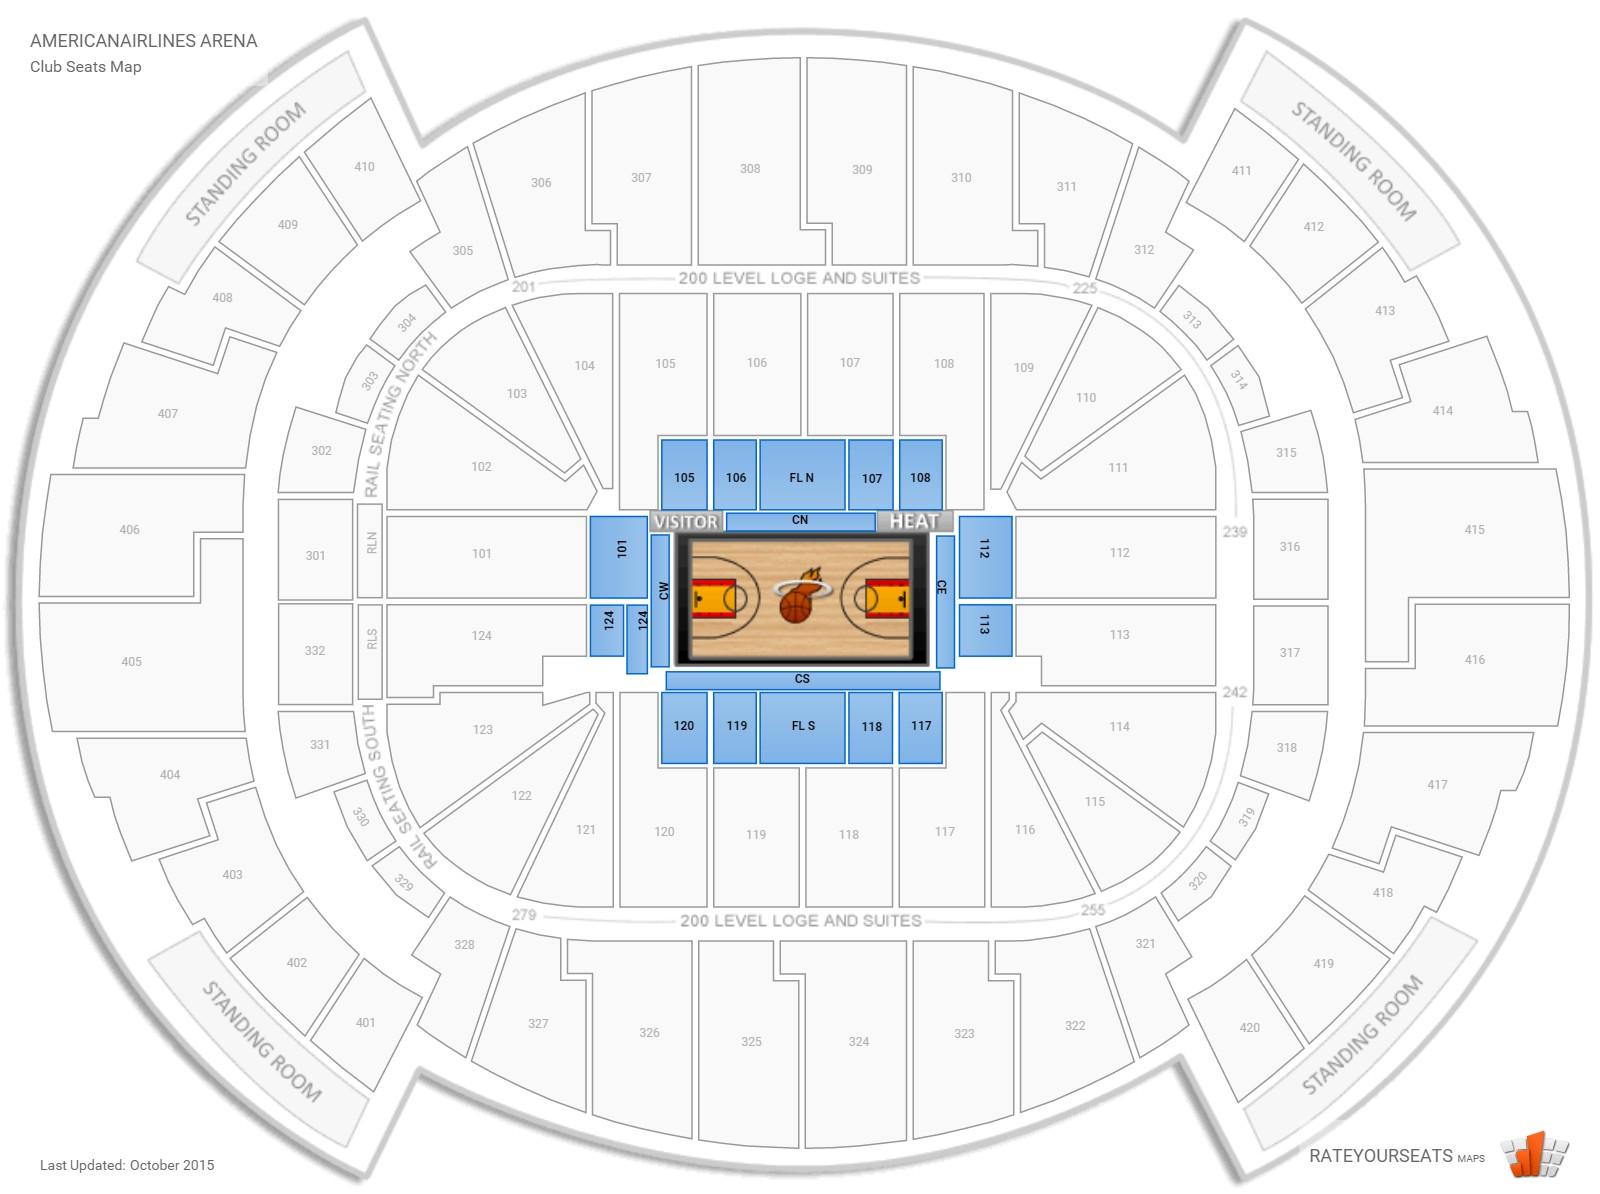 club and premium seating at americanairlines arena